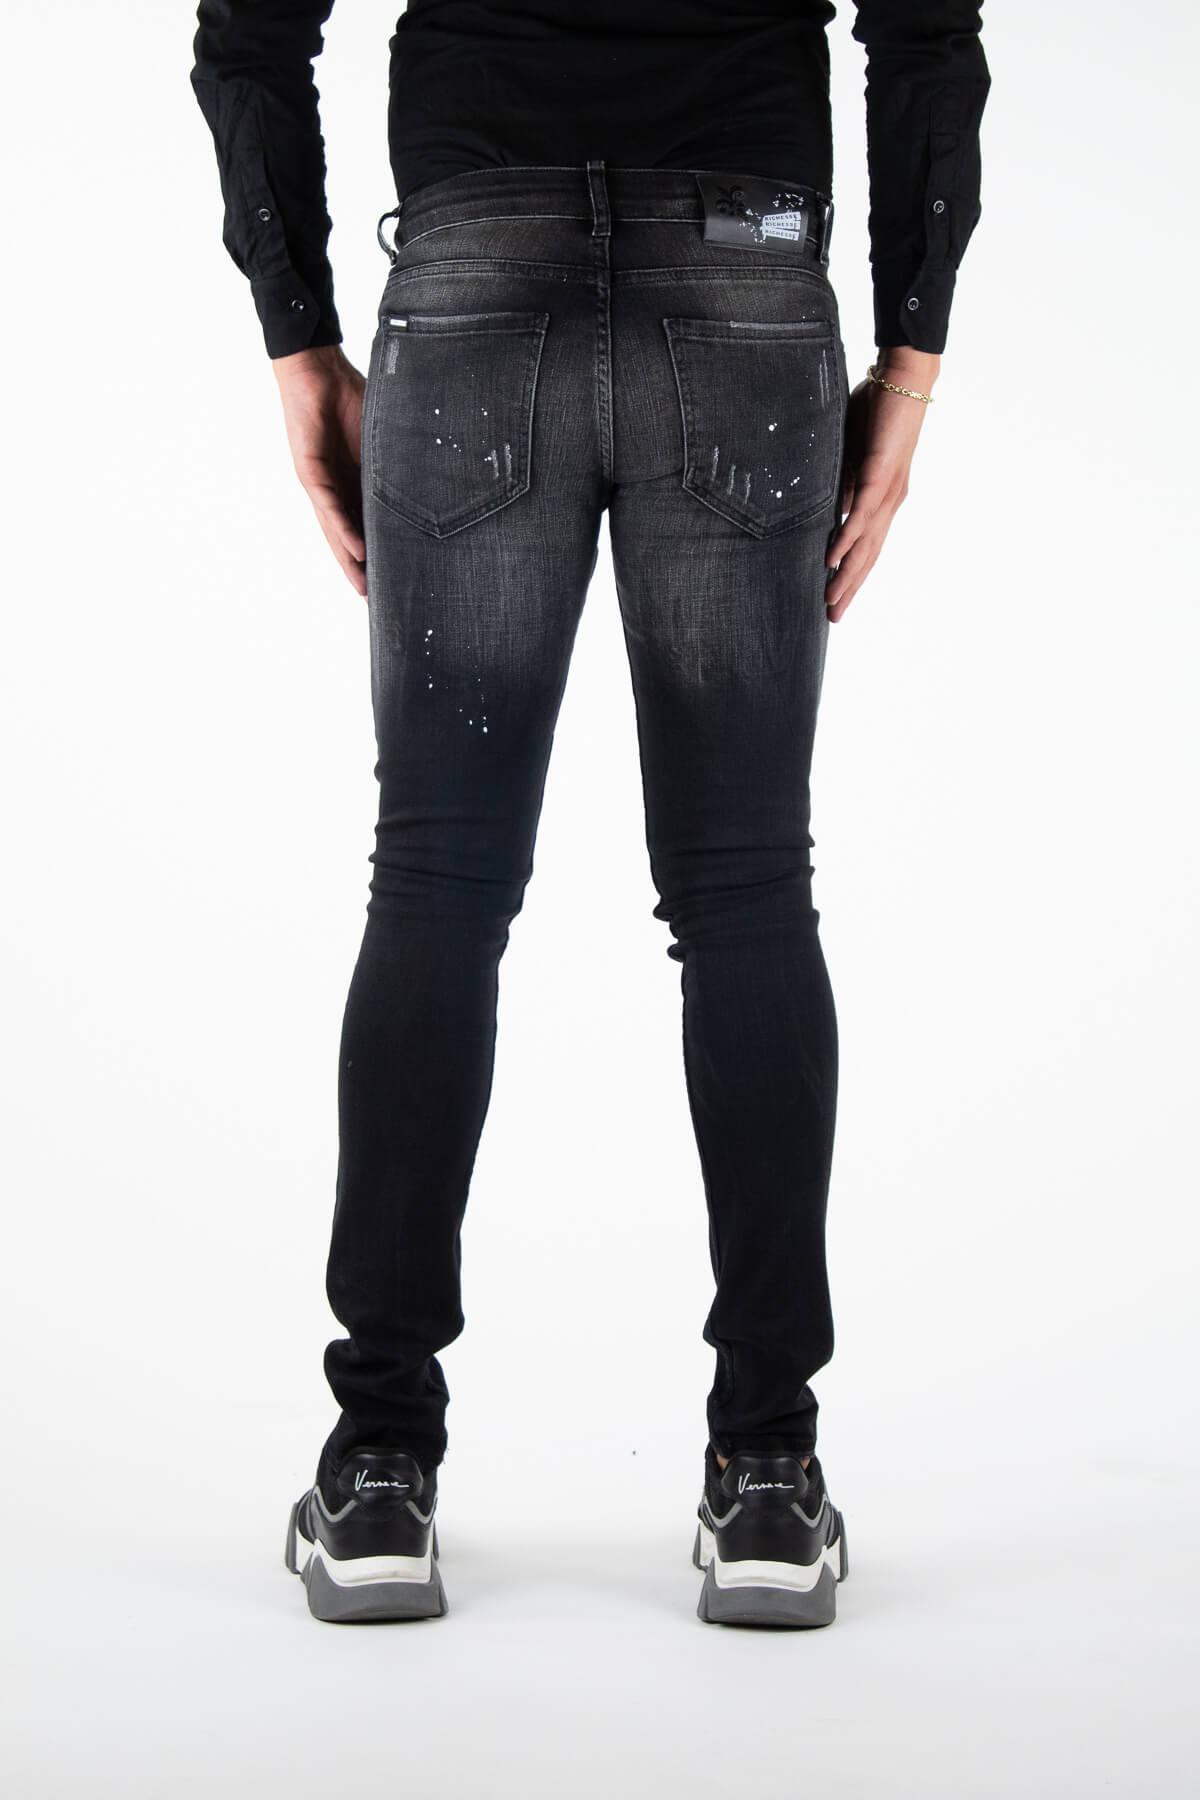 Alicante Deluxe Black Jeans-4